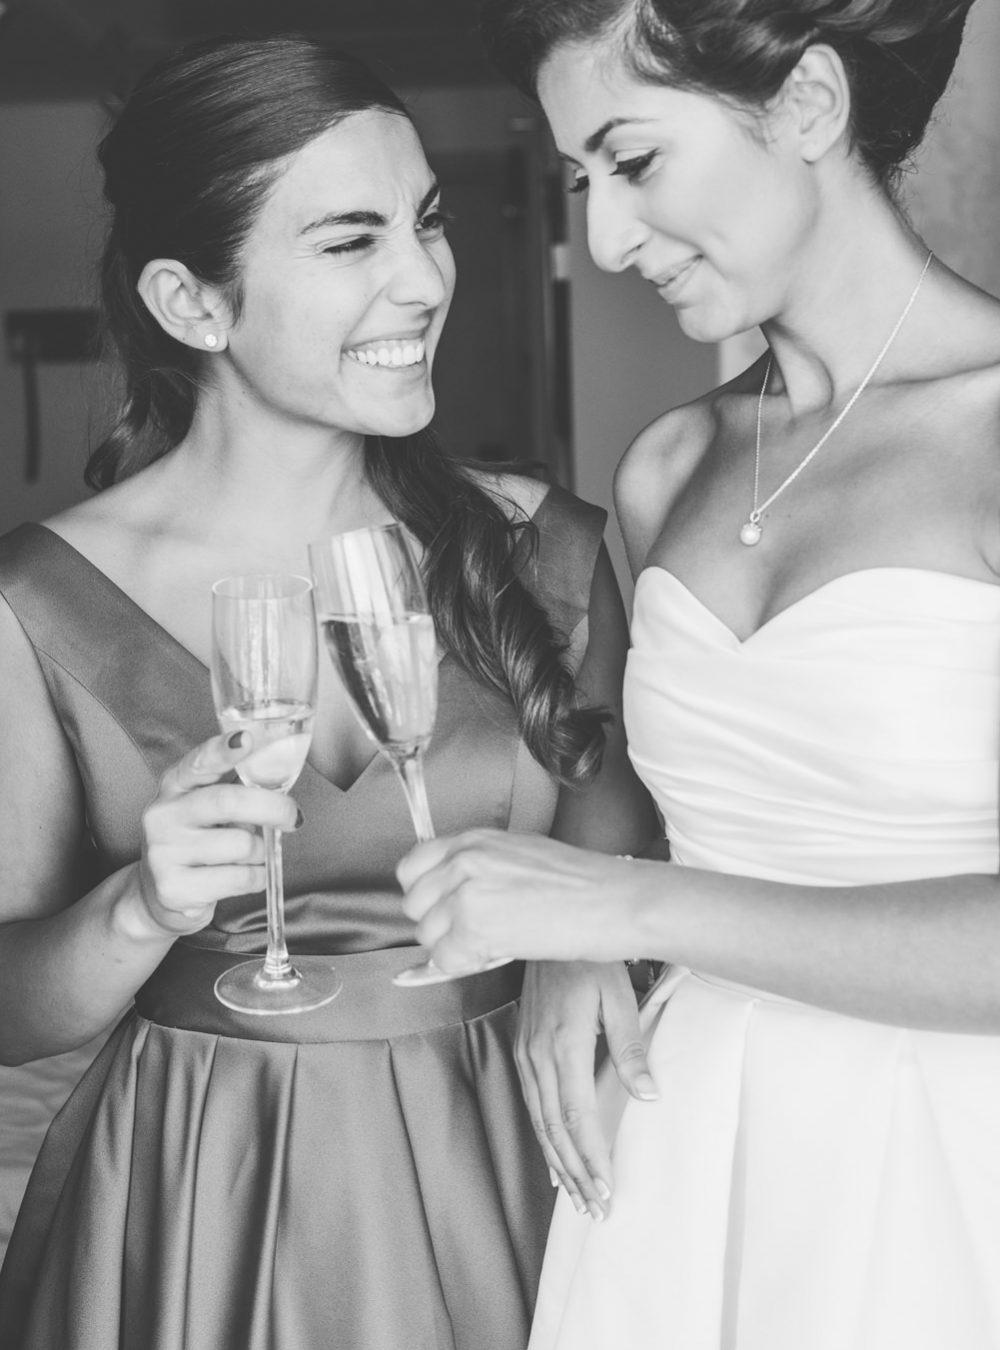 Ali-Shokofan-Asal-Fard-Wedding-Brollop-Telegrafberget-Persian-Nacka-Stockholm-Fotograf-Martina-Lundborg-14